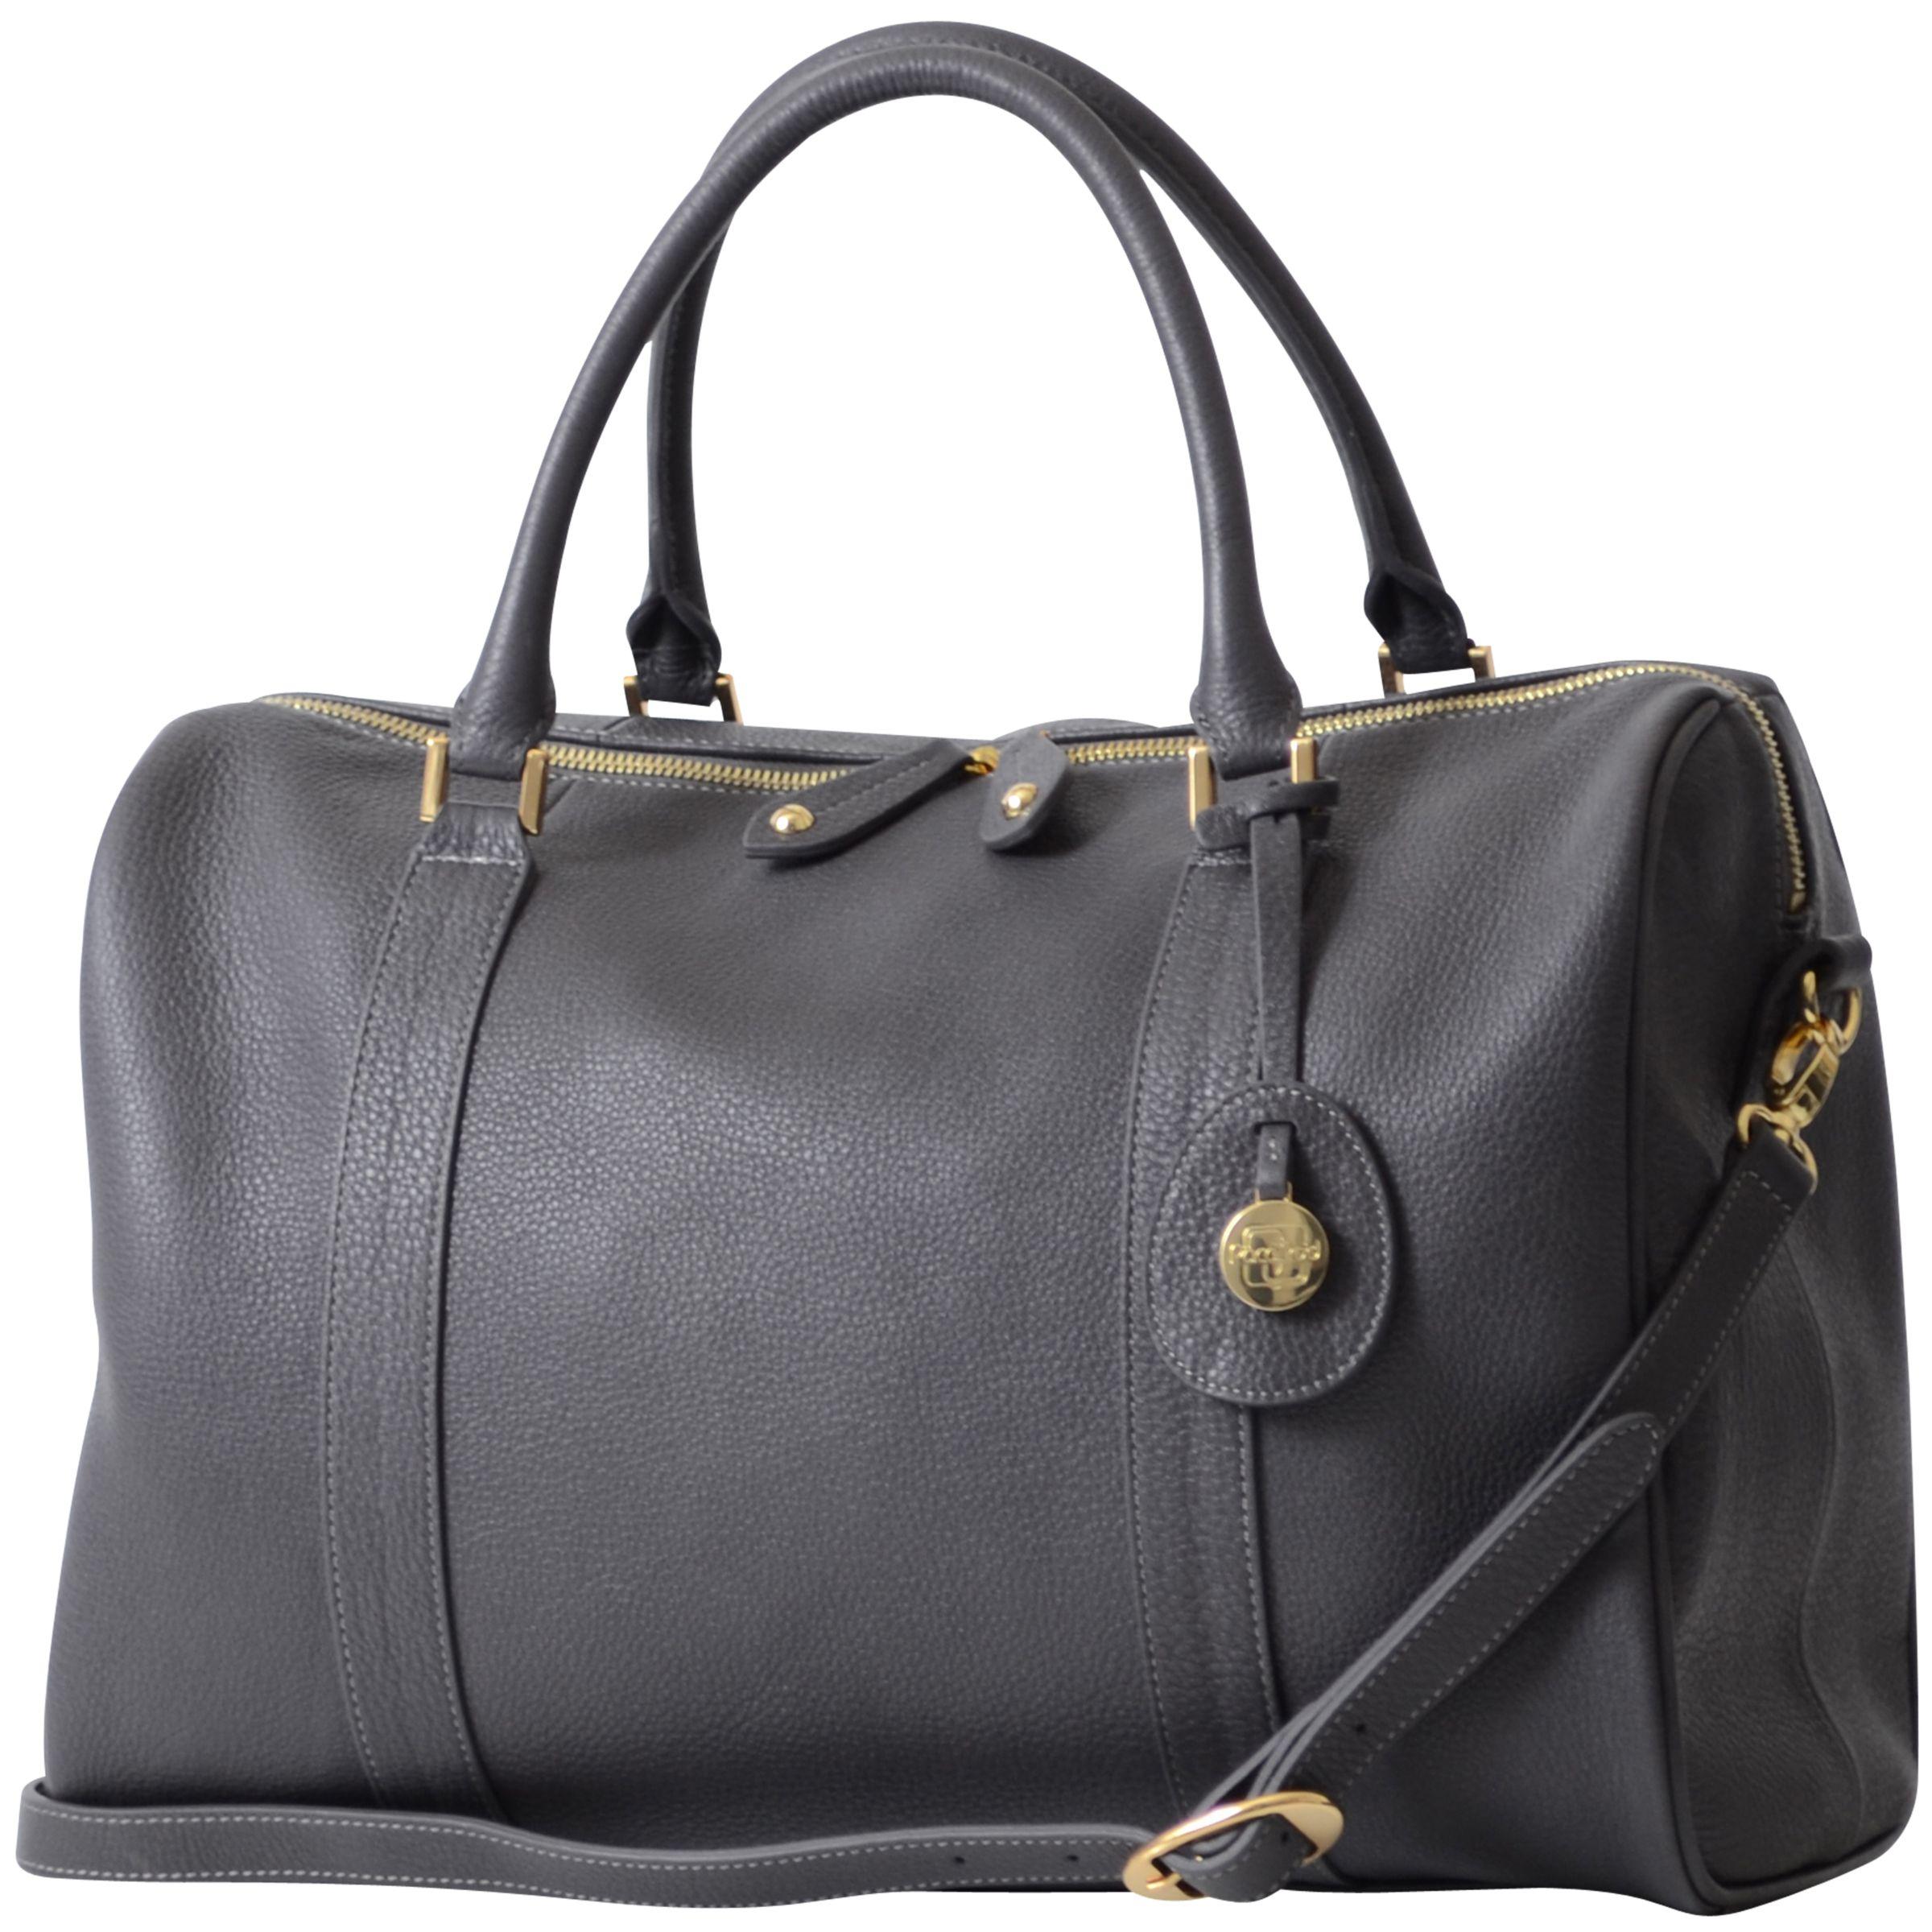 PacaPod PacaPod Firenze Changing Bag, Pewter